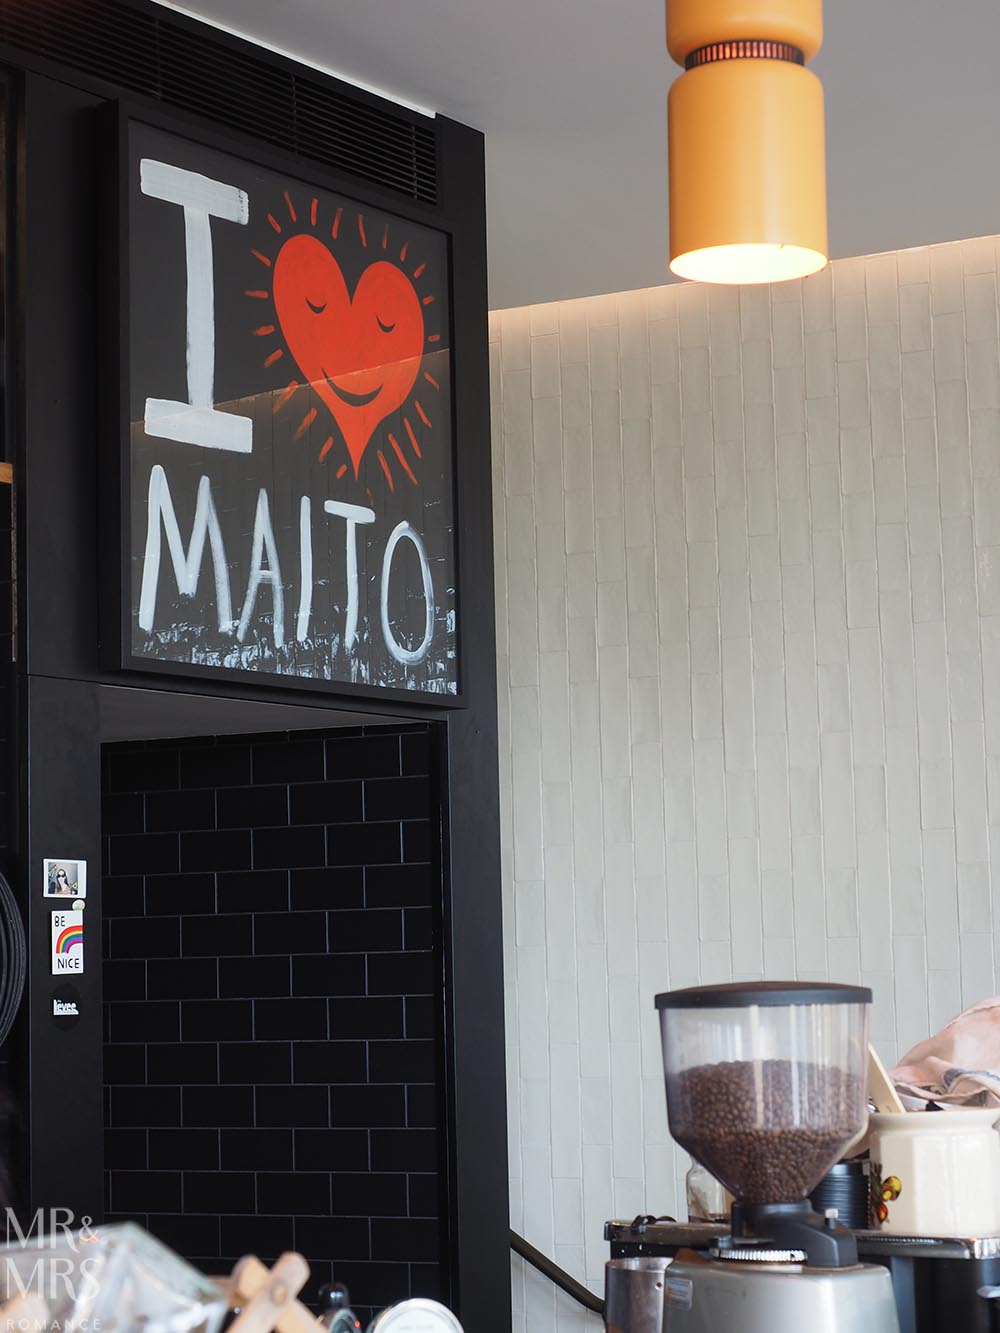 Coquun, Maitland - I love Maito